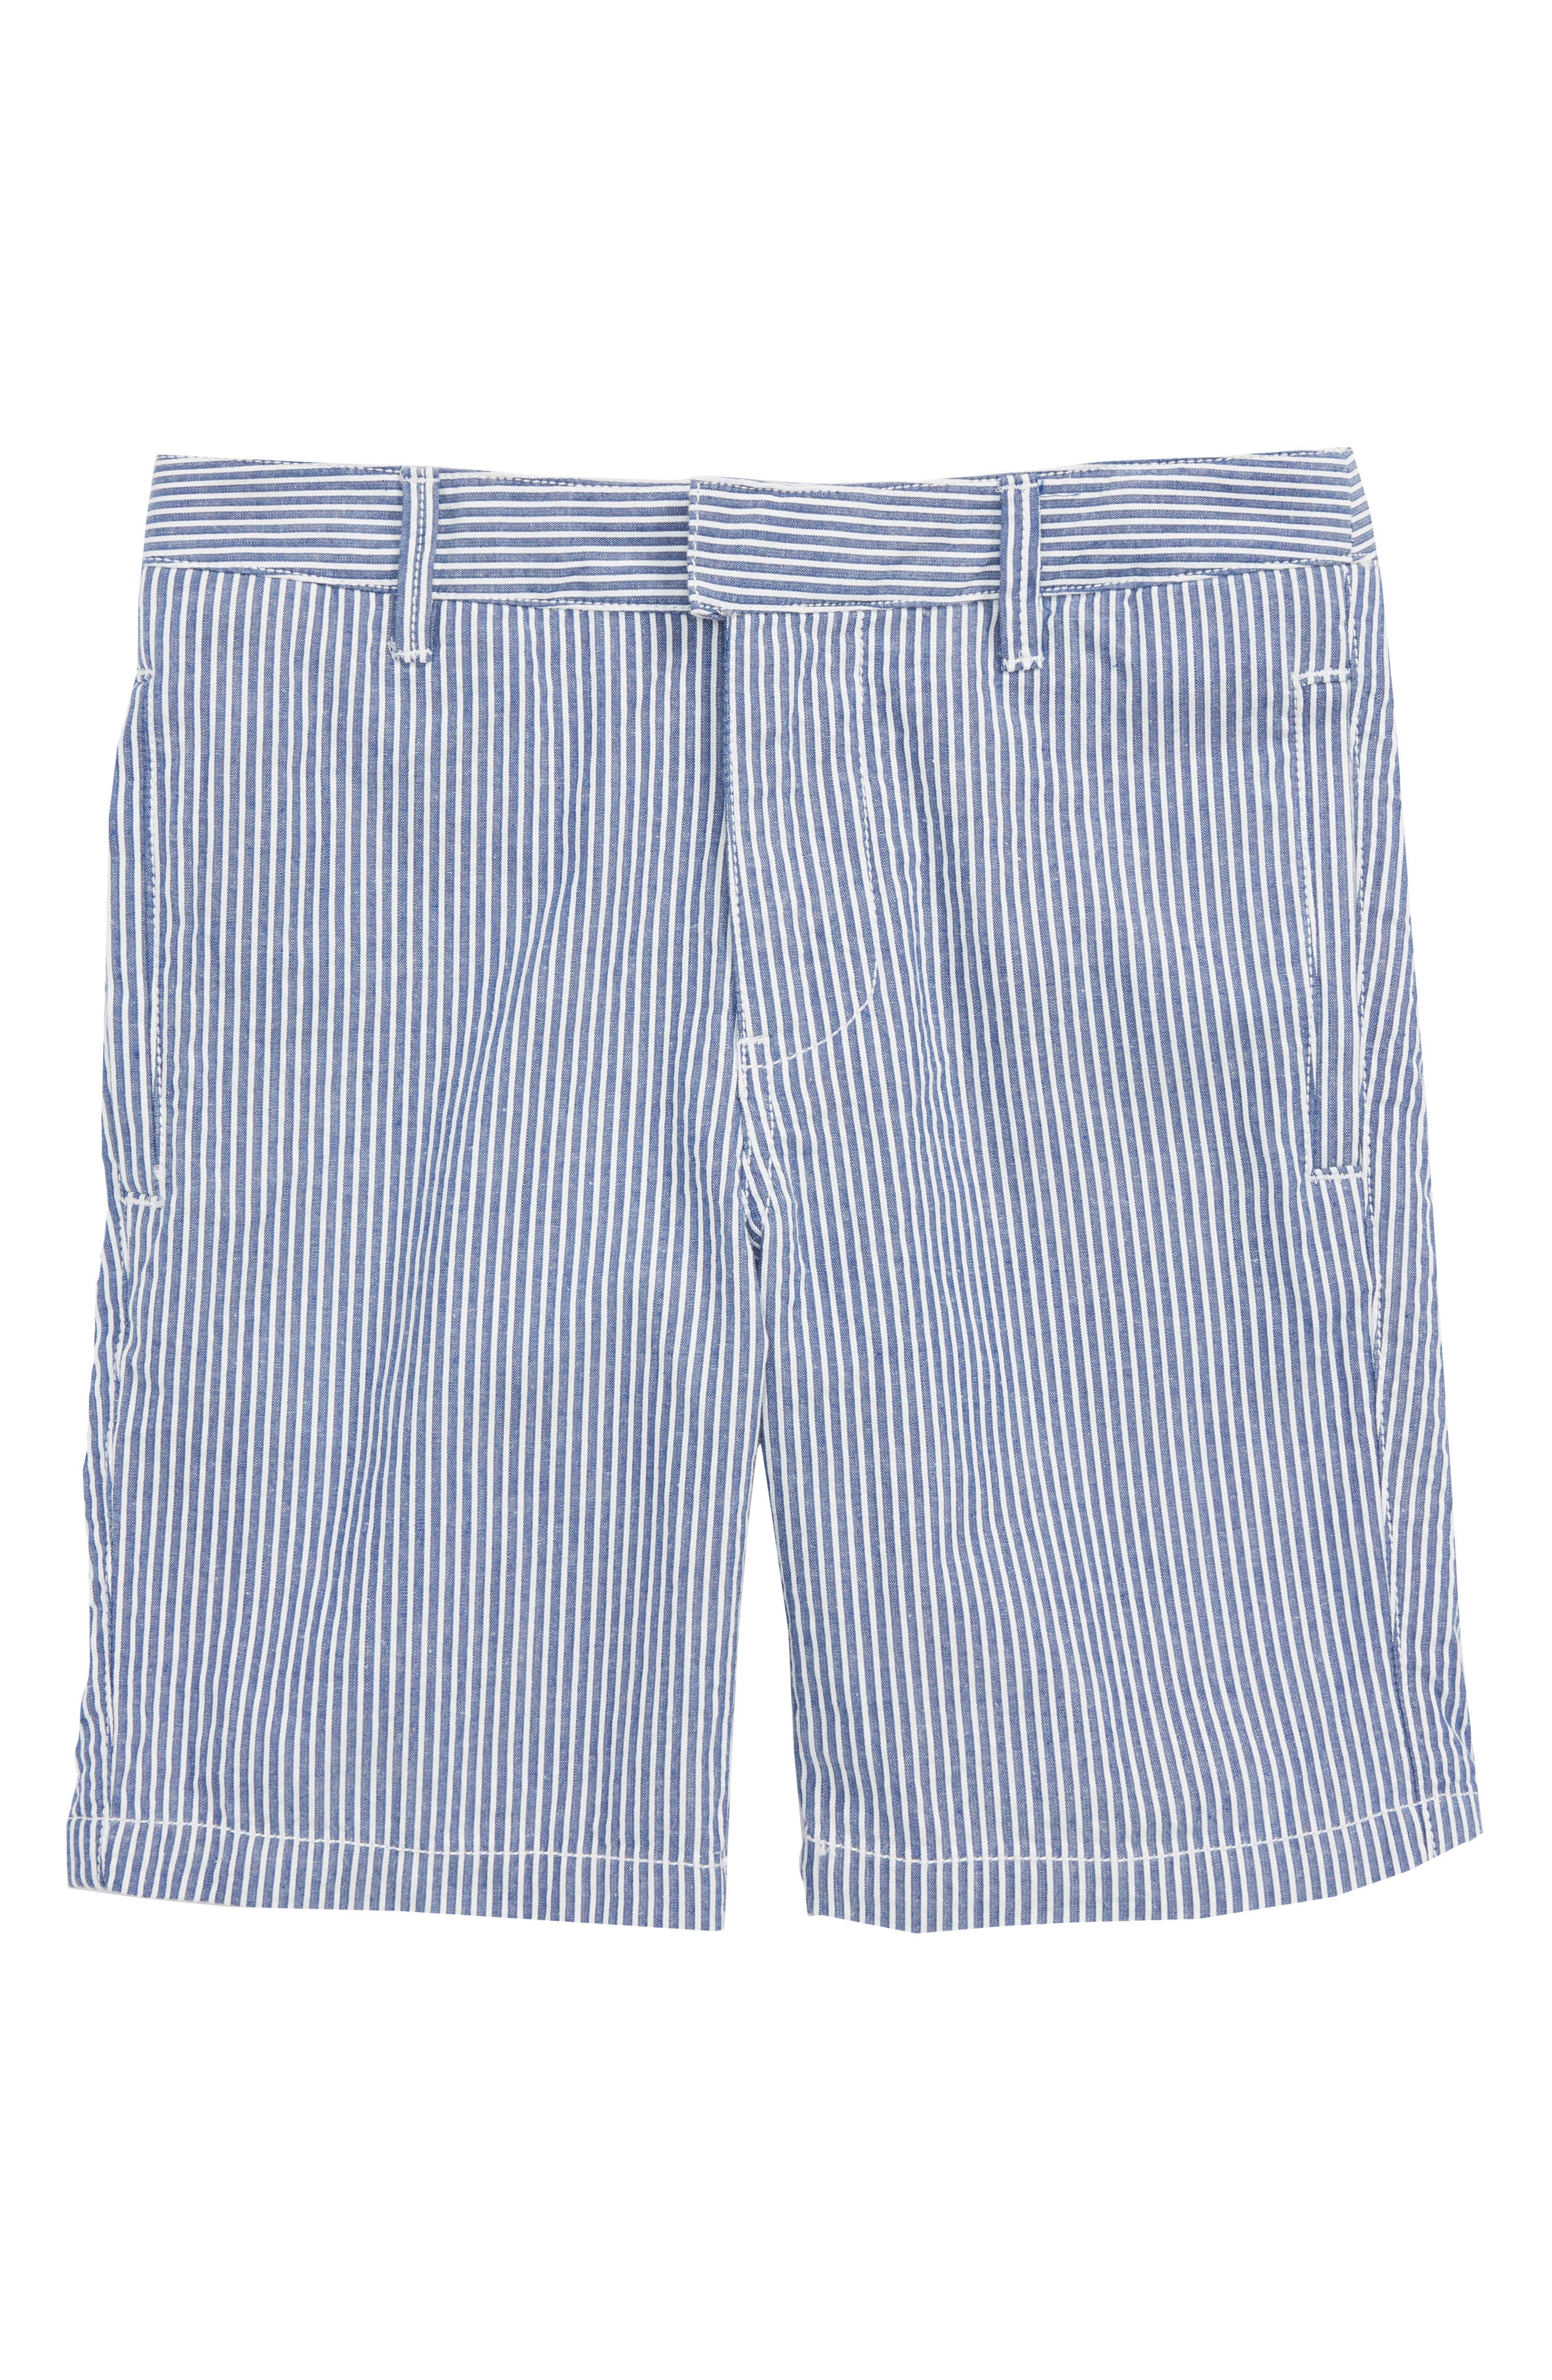 Smart Stripe Shorts,                         Main,                         color, Duke Blue/ Ecru Seersucker